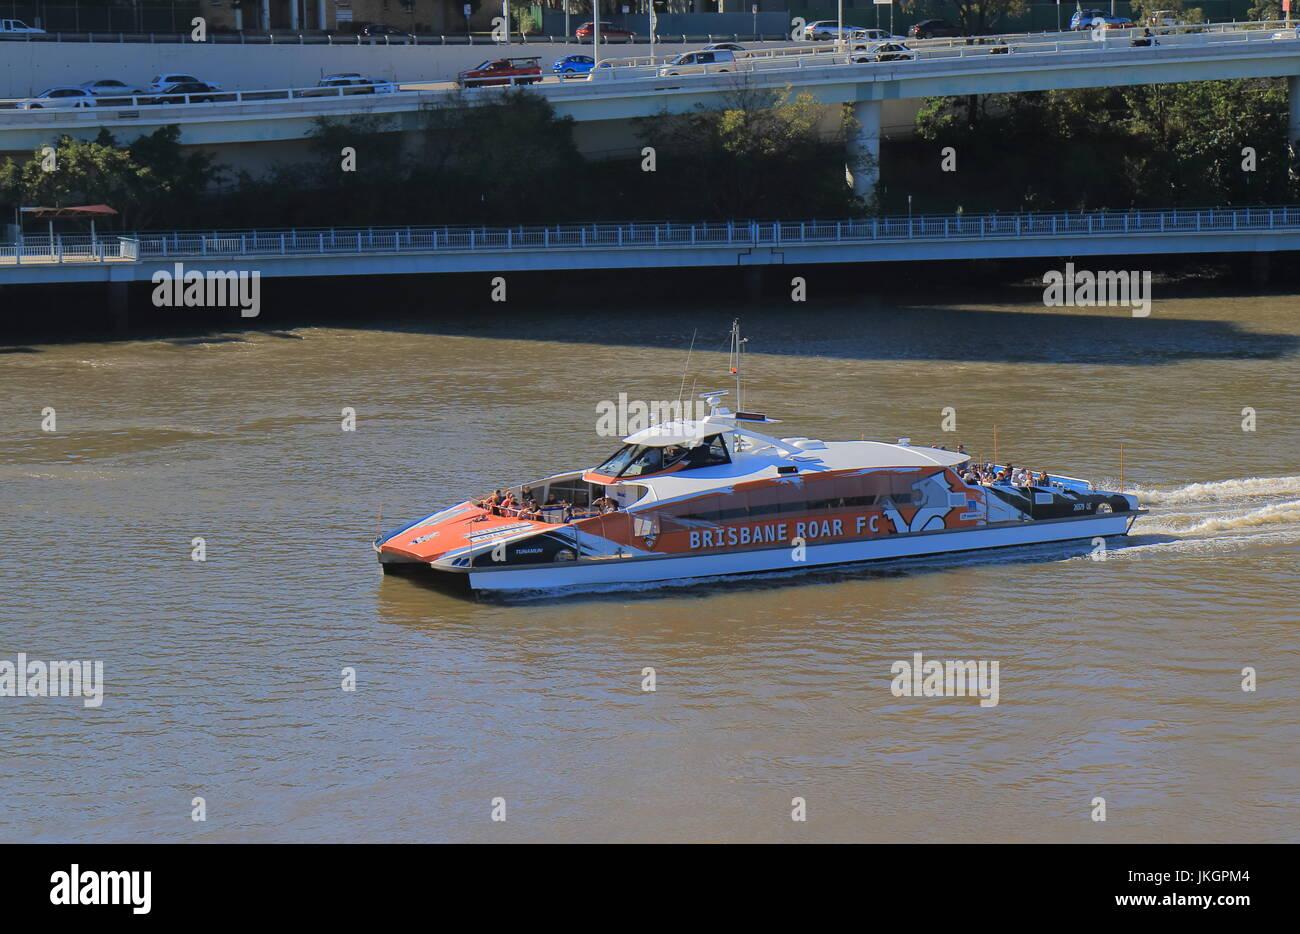 Sightseeing cruise boat Citycat sails on Brisbane river in downtown Brisbane Australia. - Stock Image